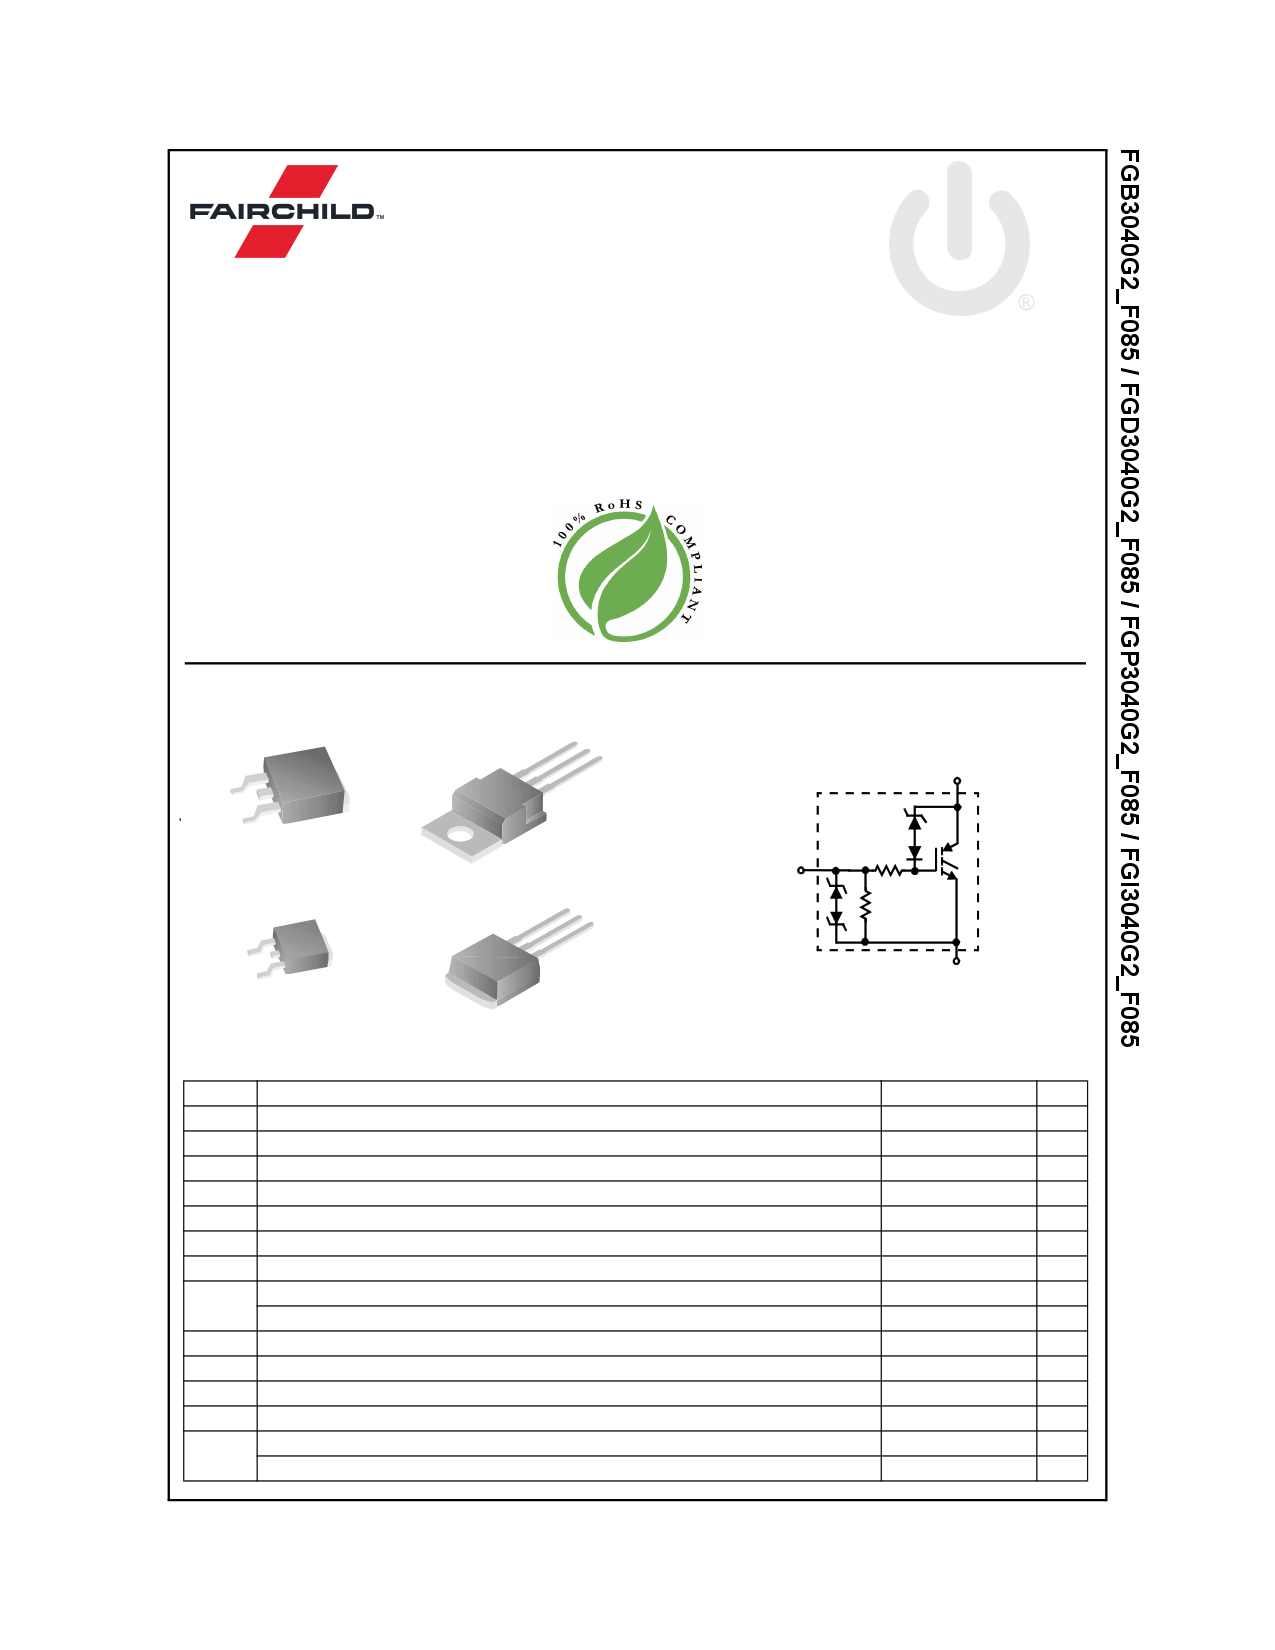 FGD3040G2_F085 데이터시트 및 FGD3040G2_F085 PDF